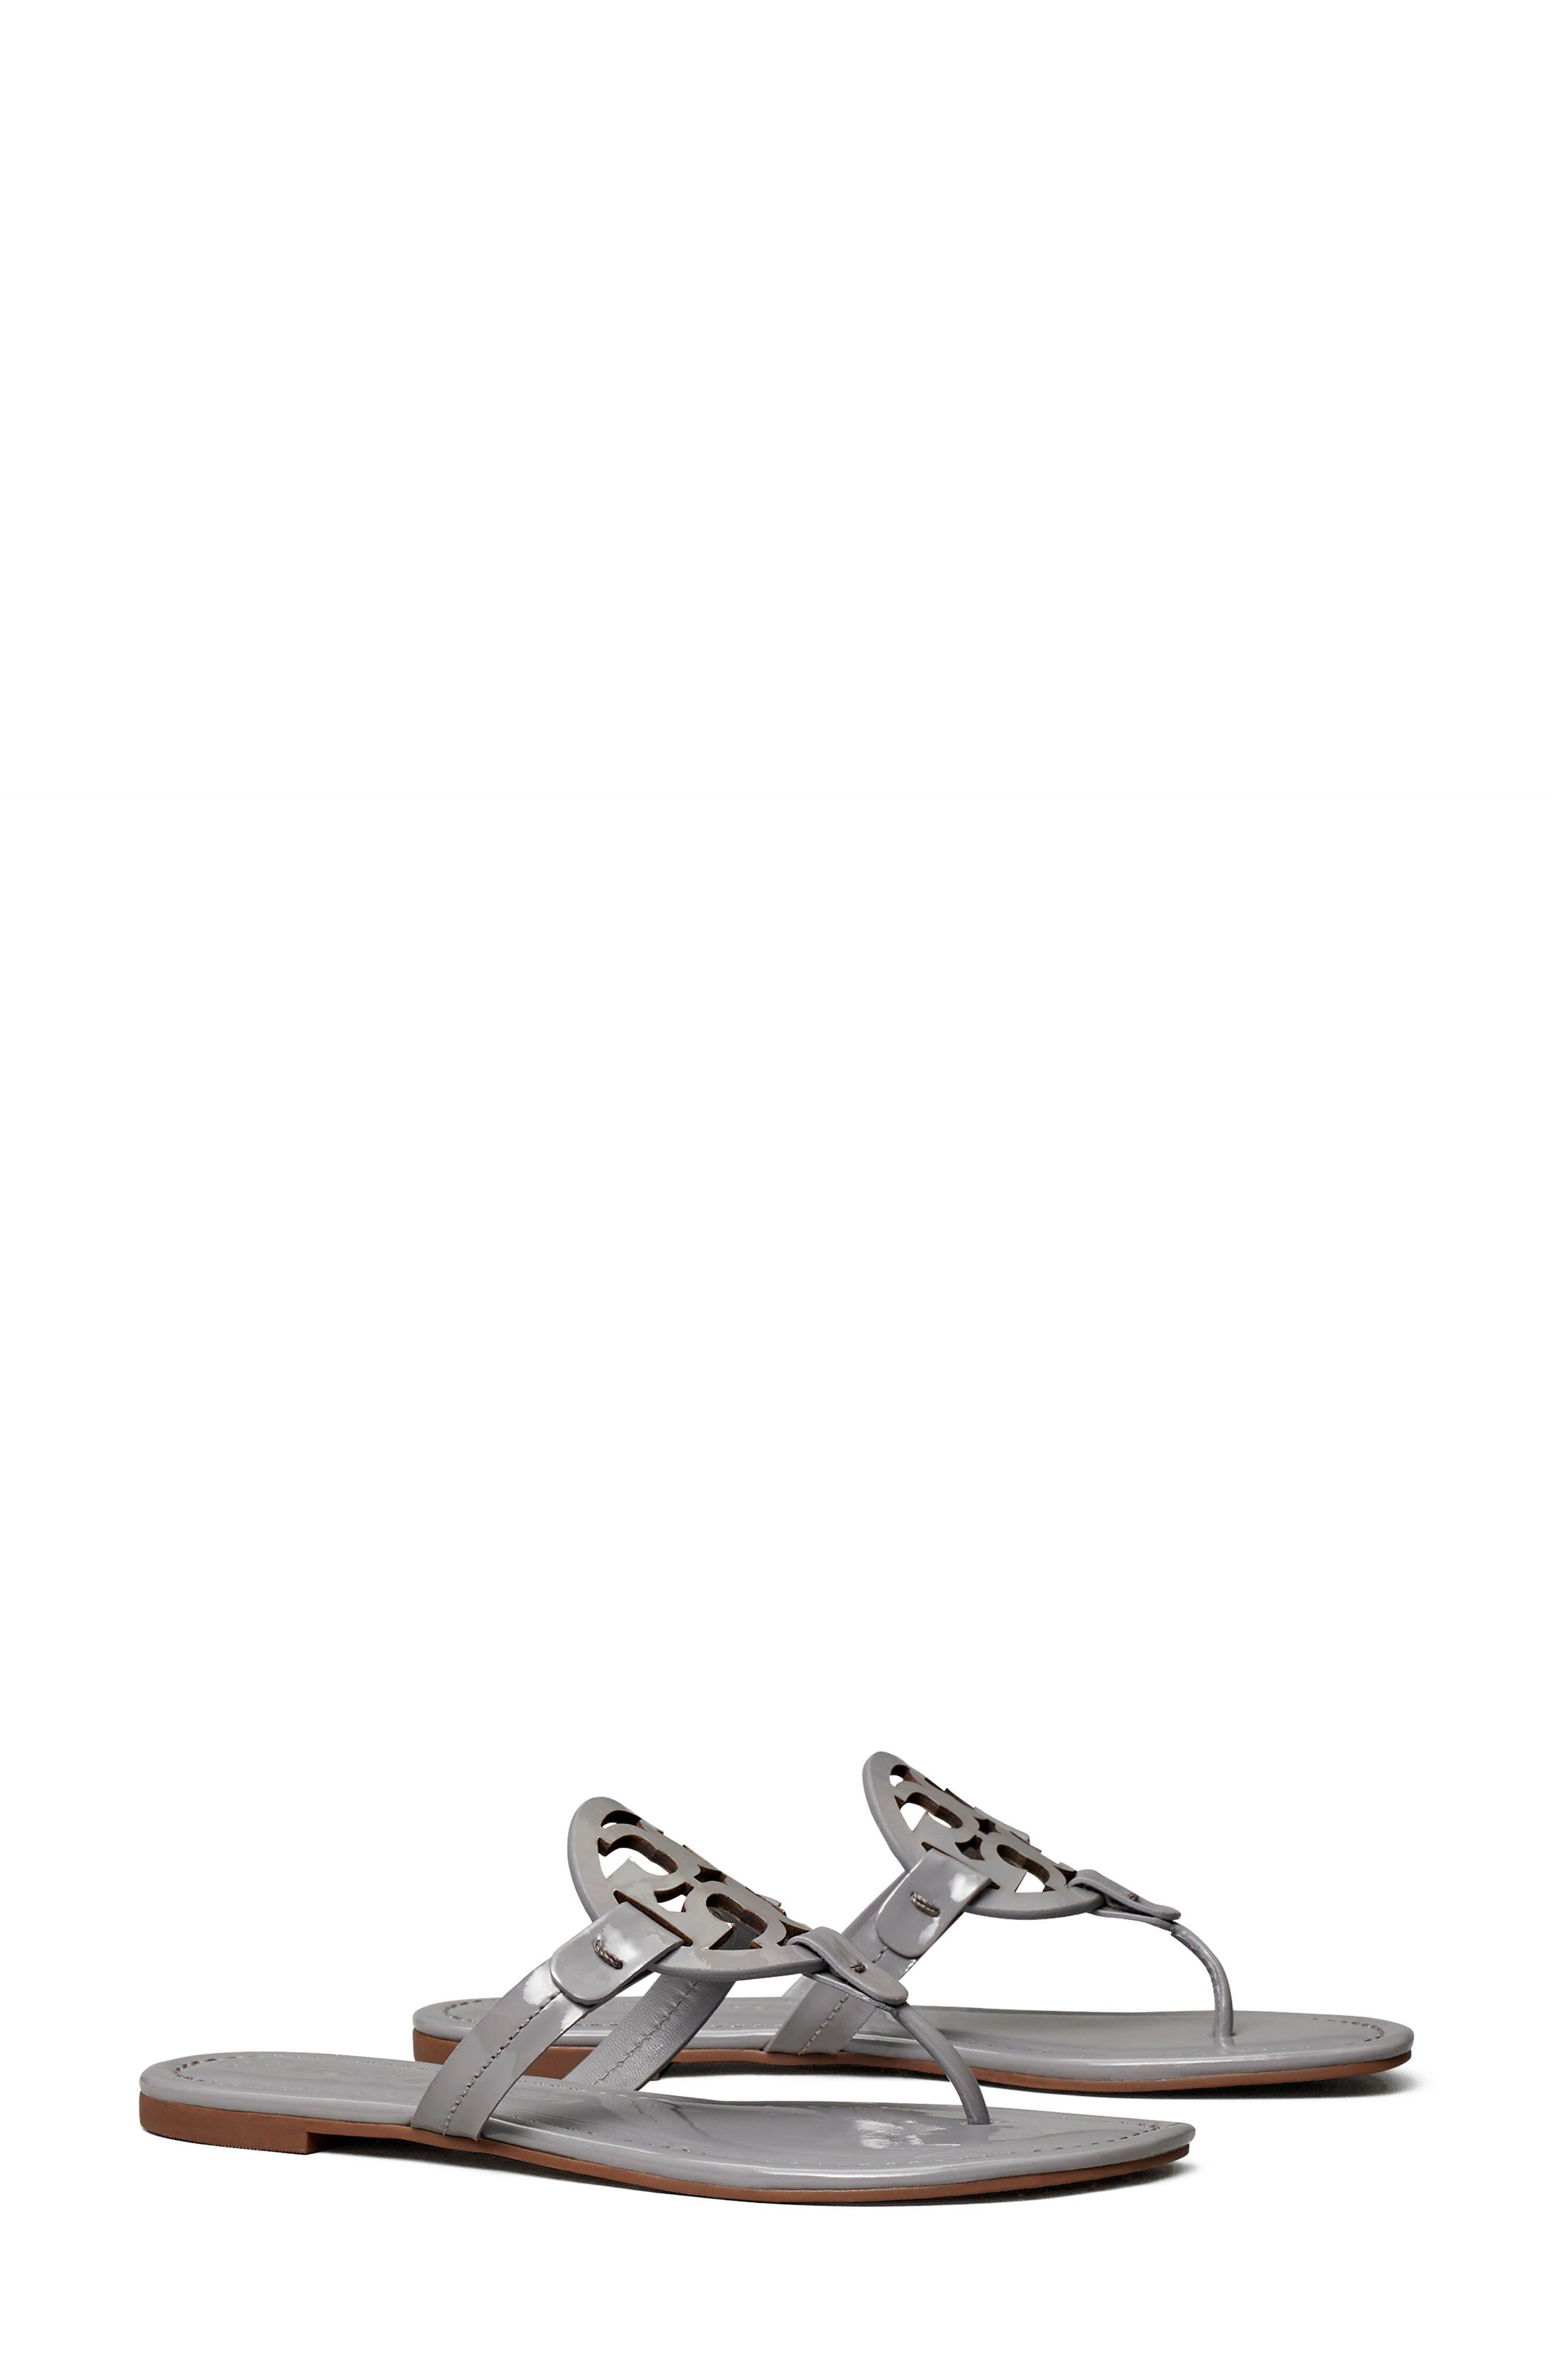 Therafit Womens Summer Sandals Comfort Thong Slingback Pink Size 9 Medium